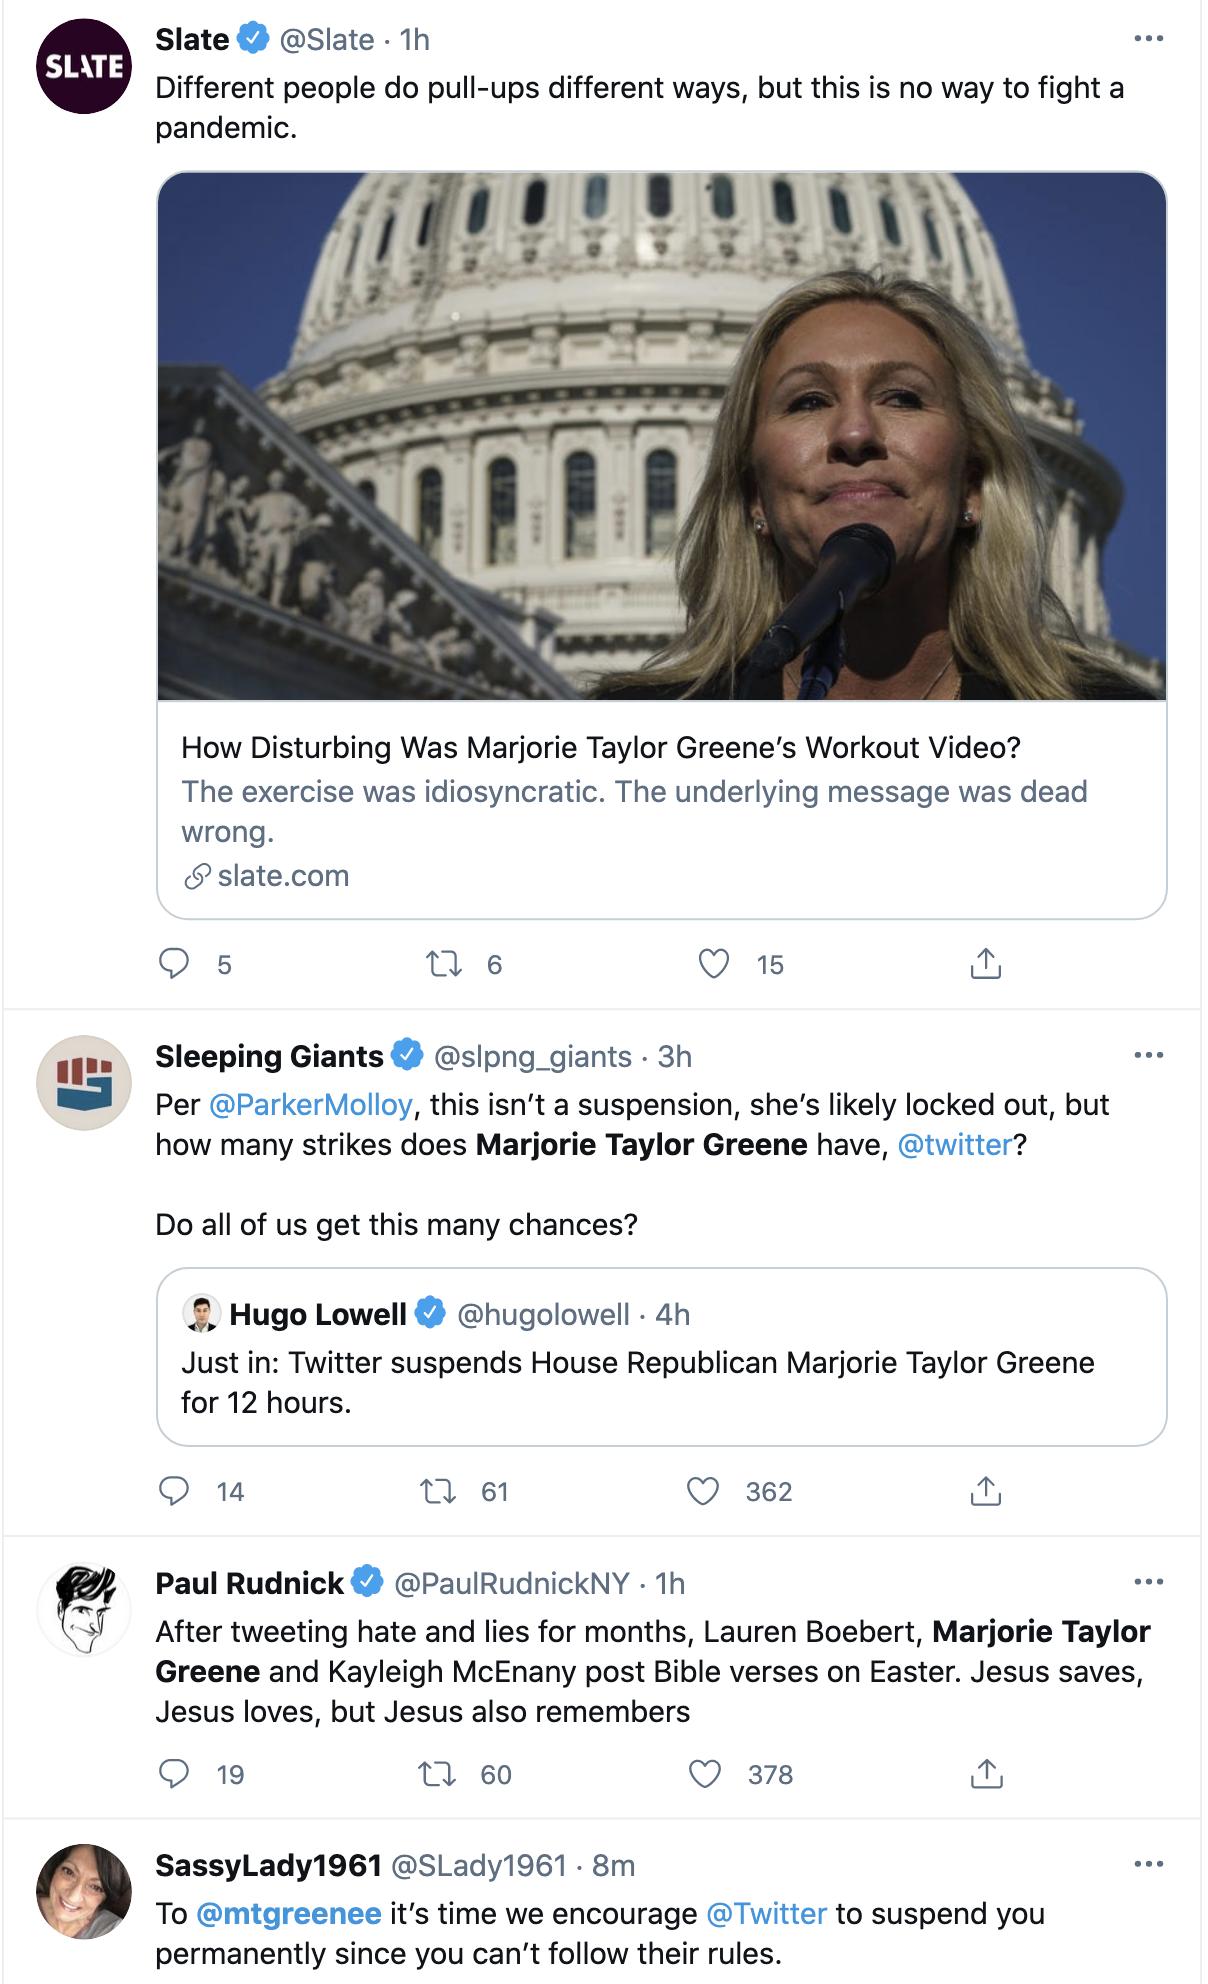 Screen-Shot-2021-04-04-at-4.58.59-PM Twitter Suspends Qanon Kook Marjorie Green Yet Again Coronavirus Featured Gun Control Politics Top Stories